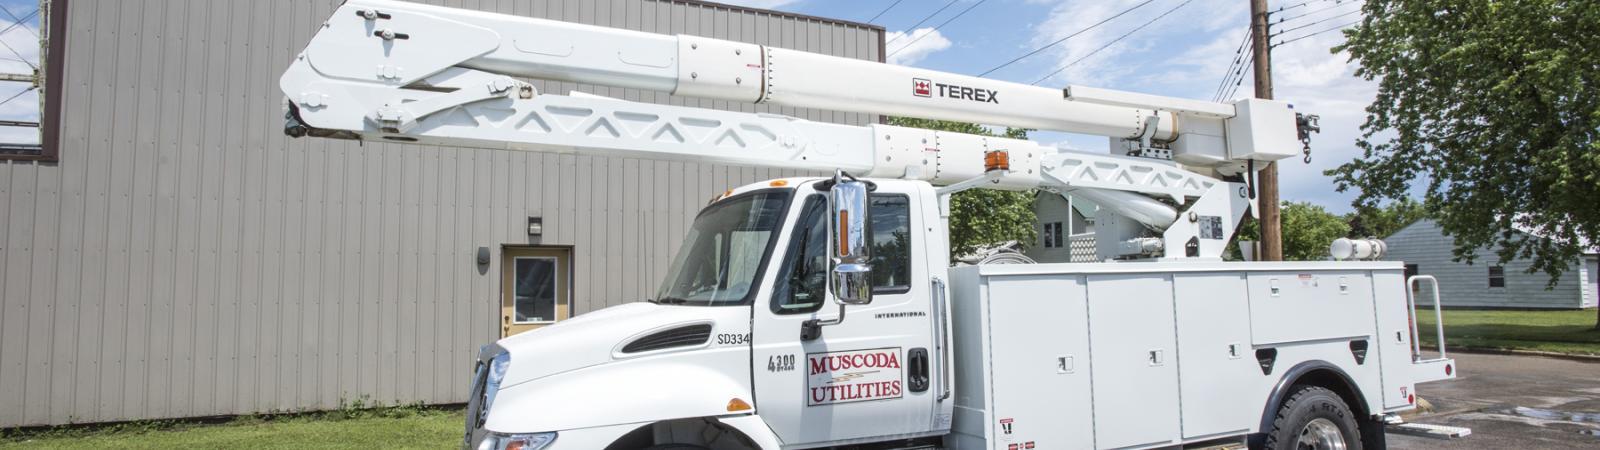 Muscoda utility truck